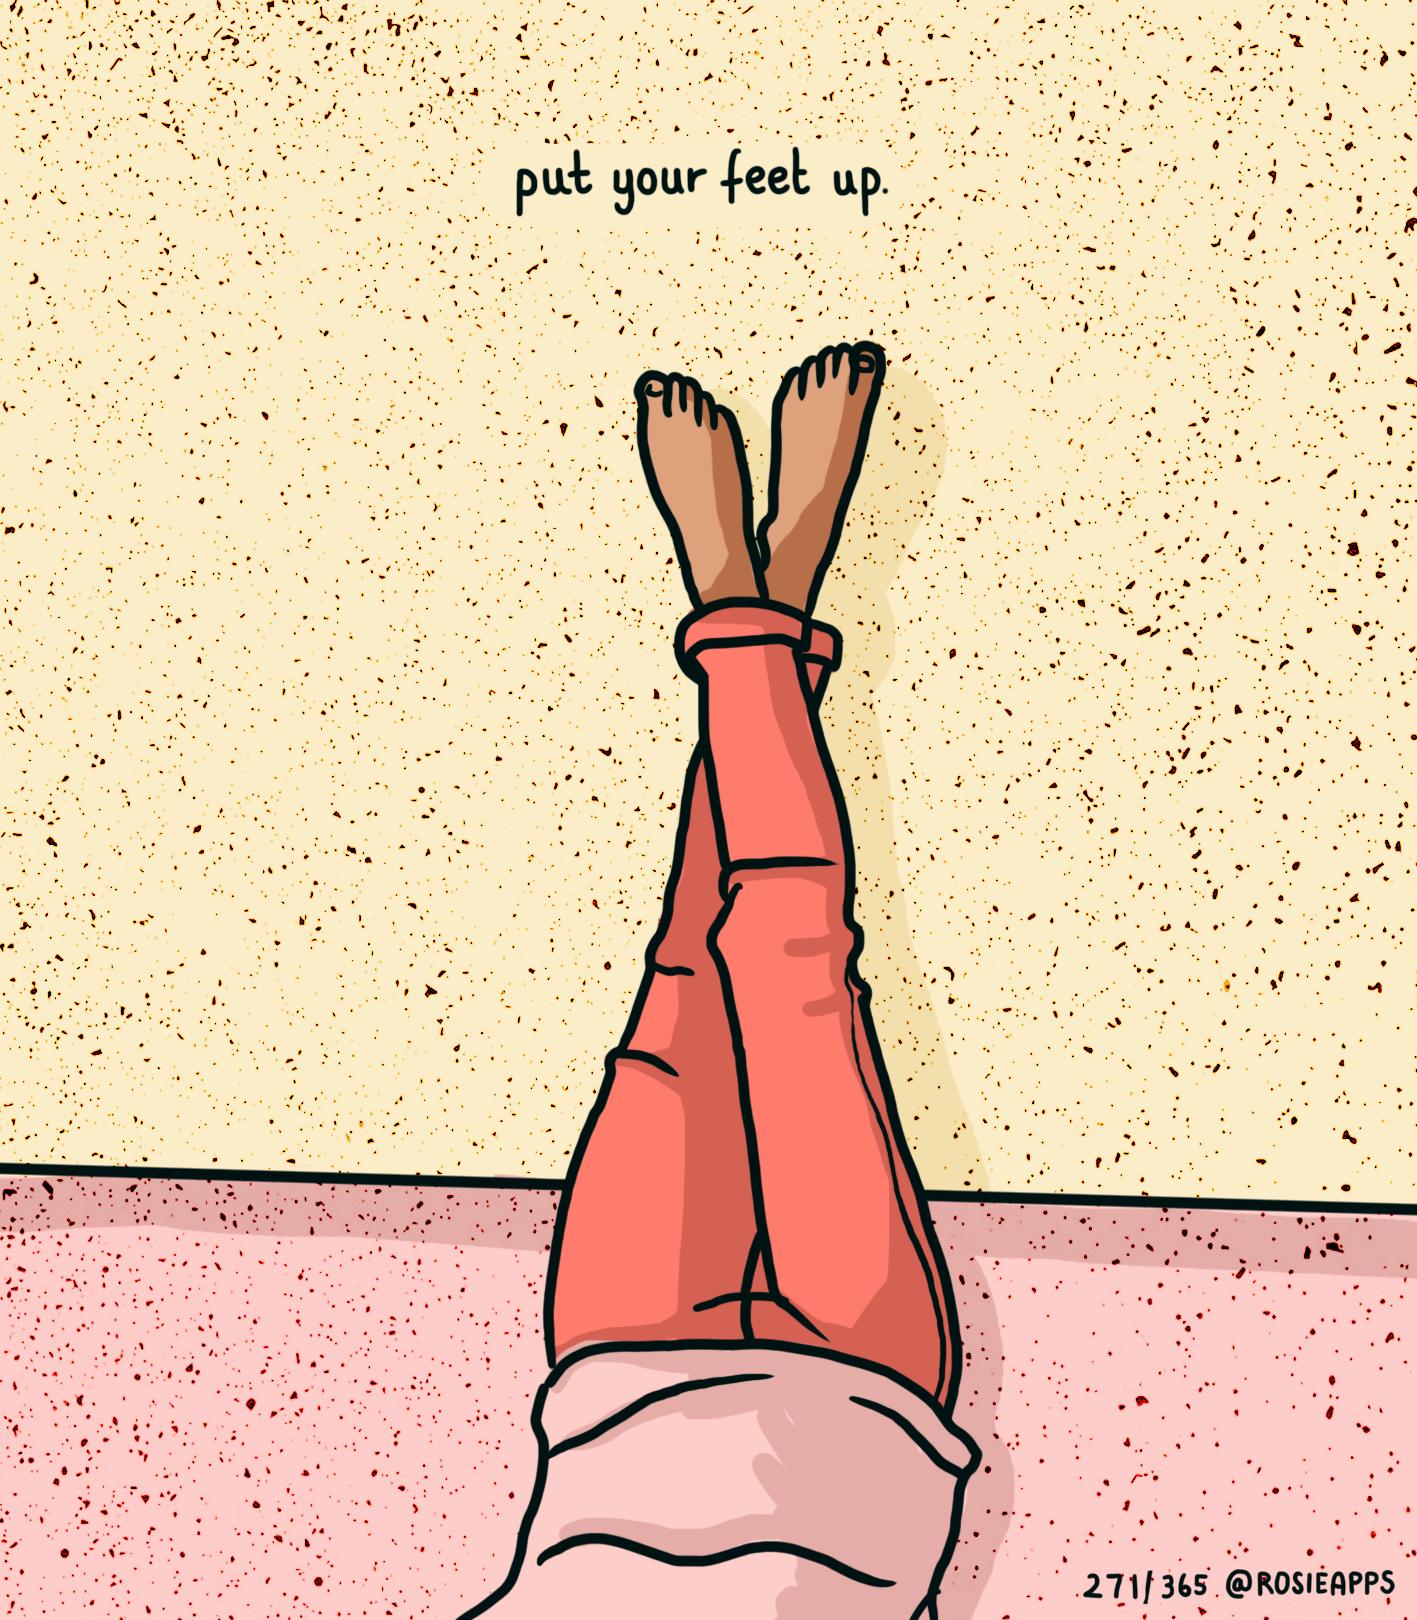 September-271-365 put your feet up.jpg